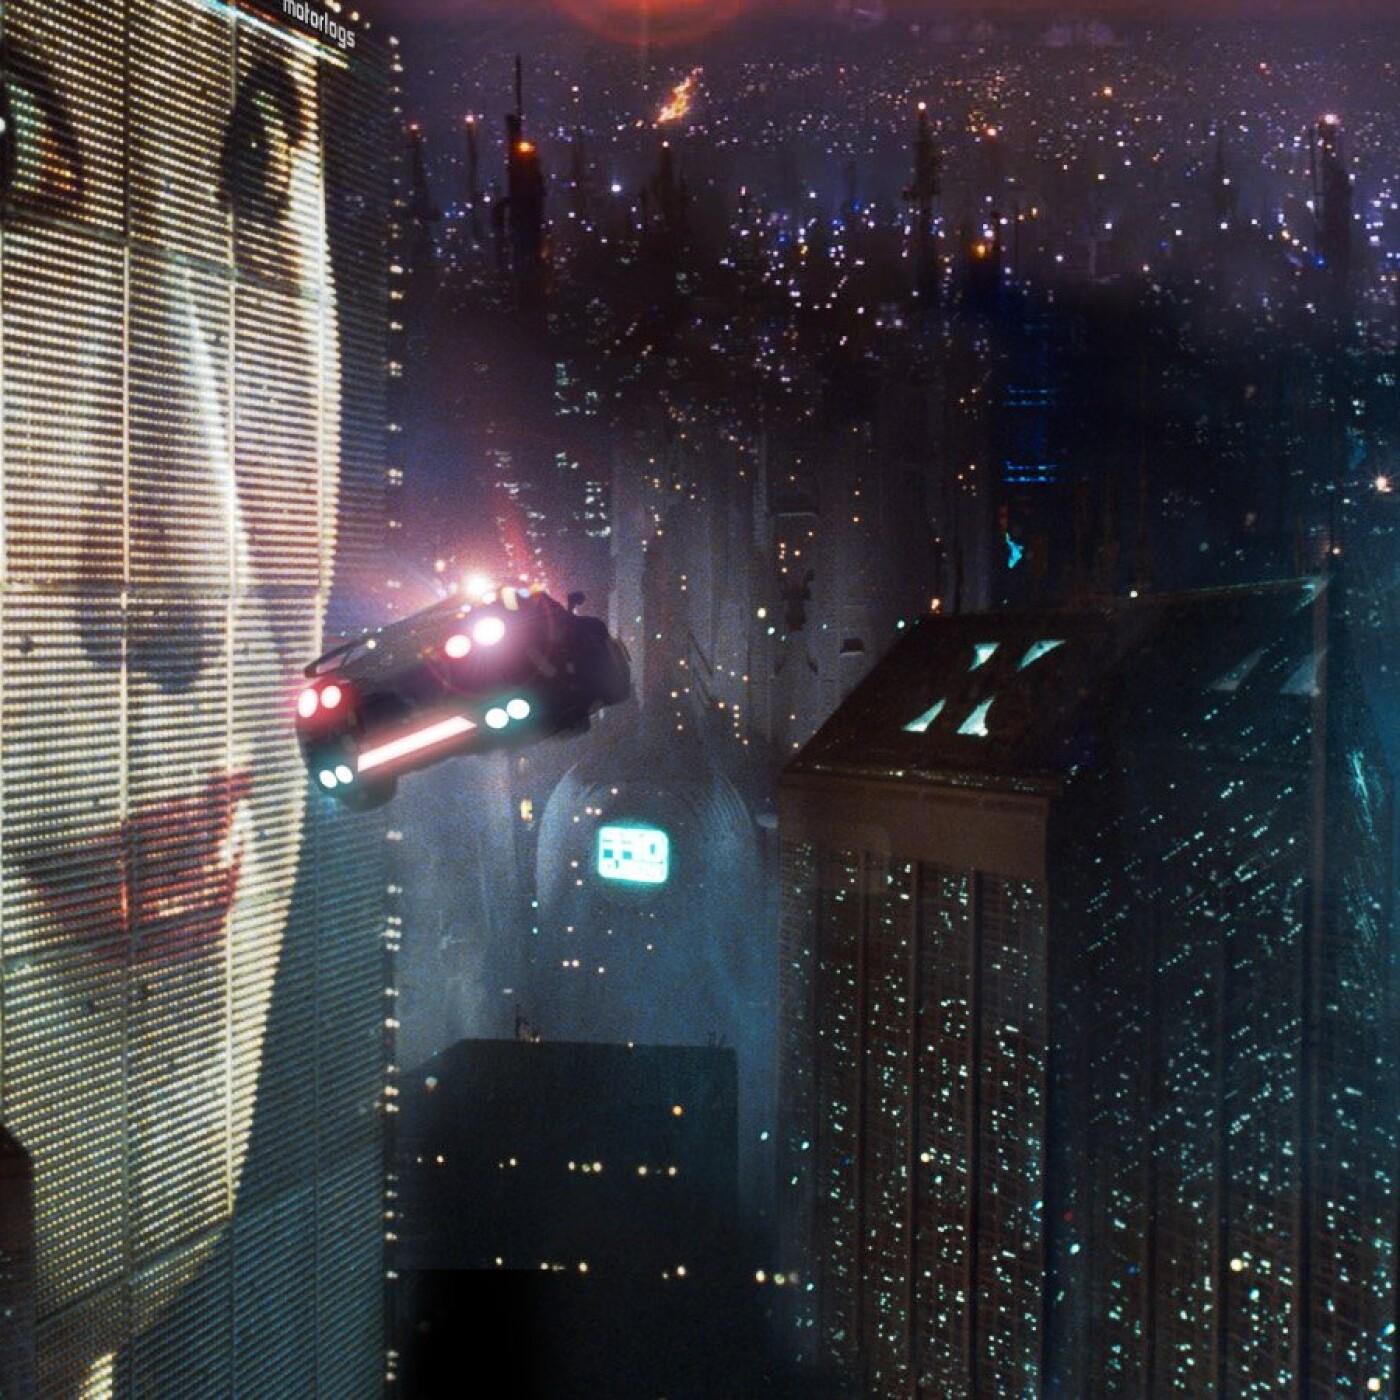 Romeo zoome sur Blade Runner de 1982 - 28 09 2021 - StereoChic Radio